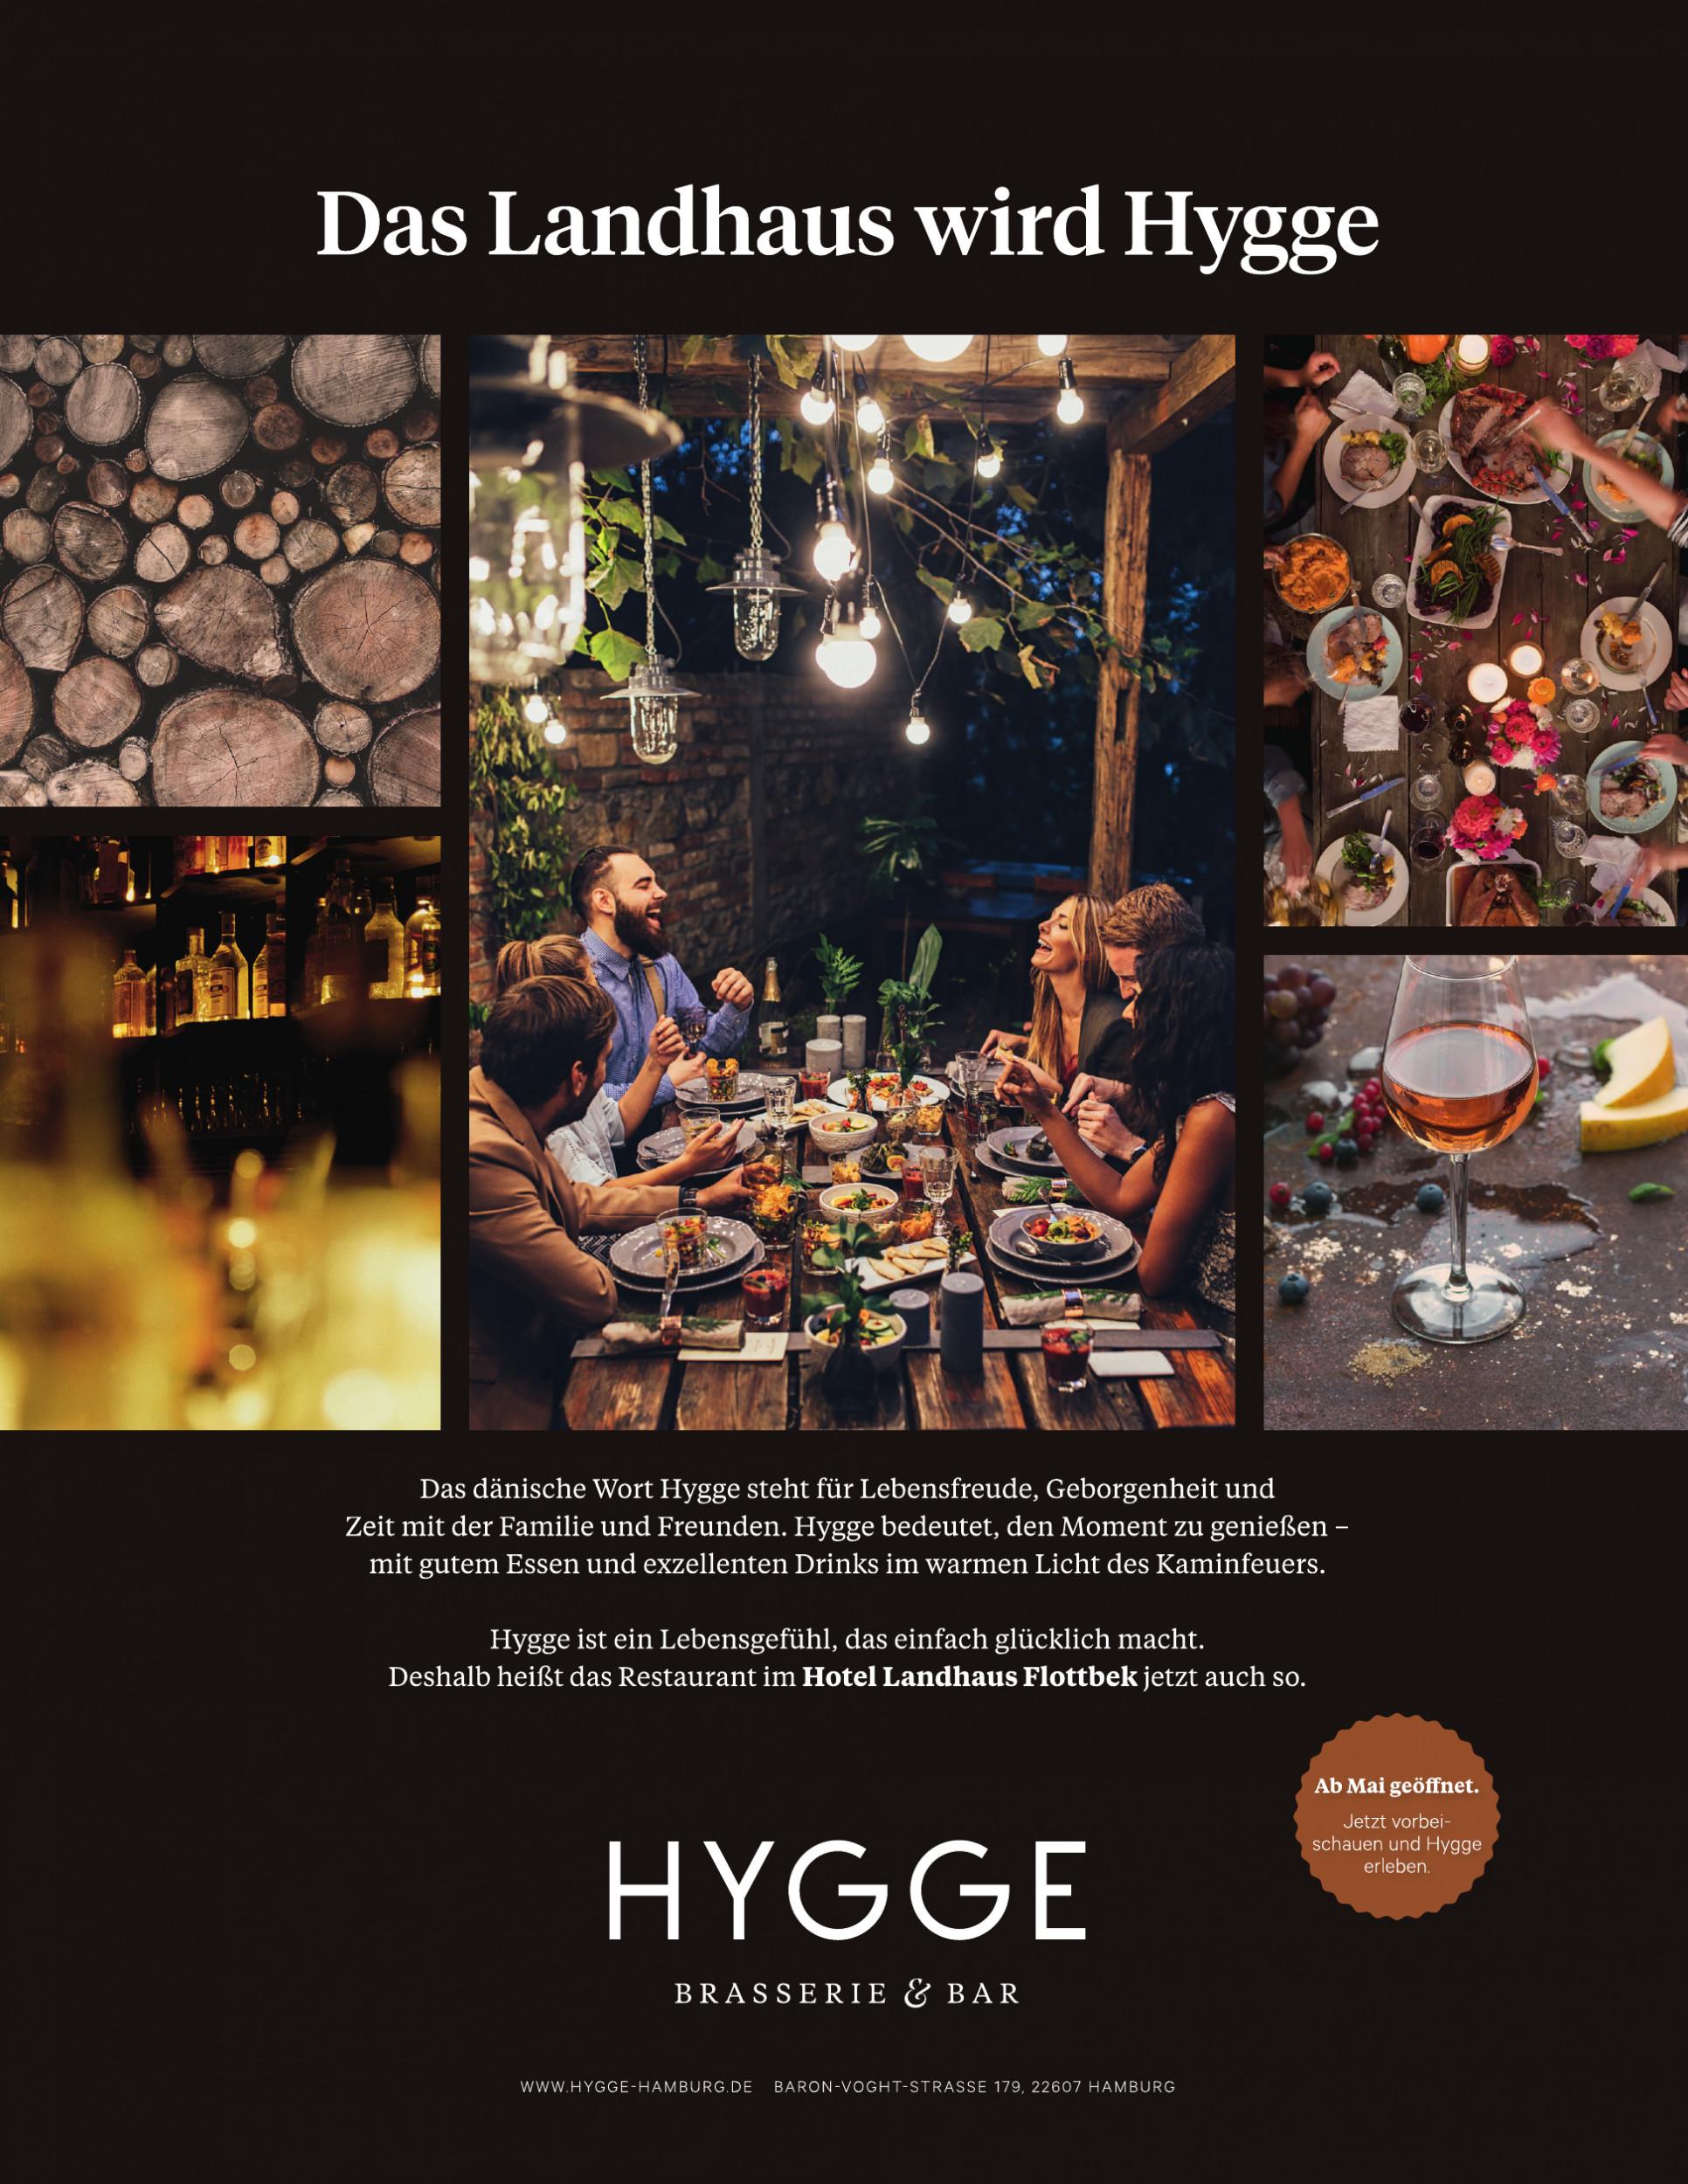 Hygge – Brasserie & Bar